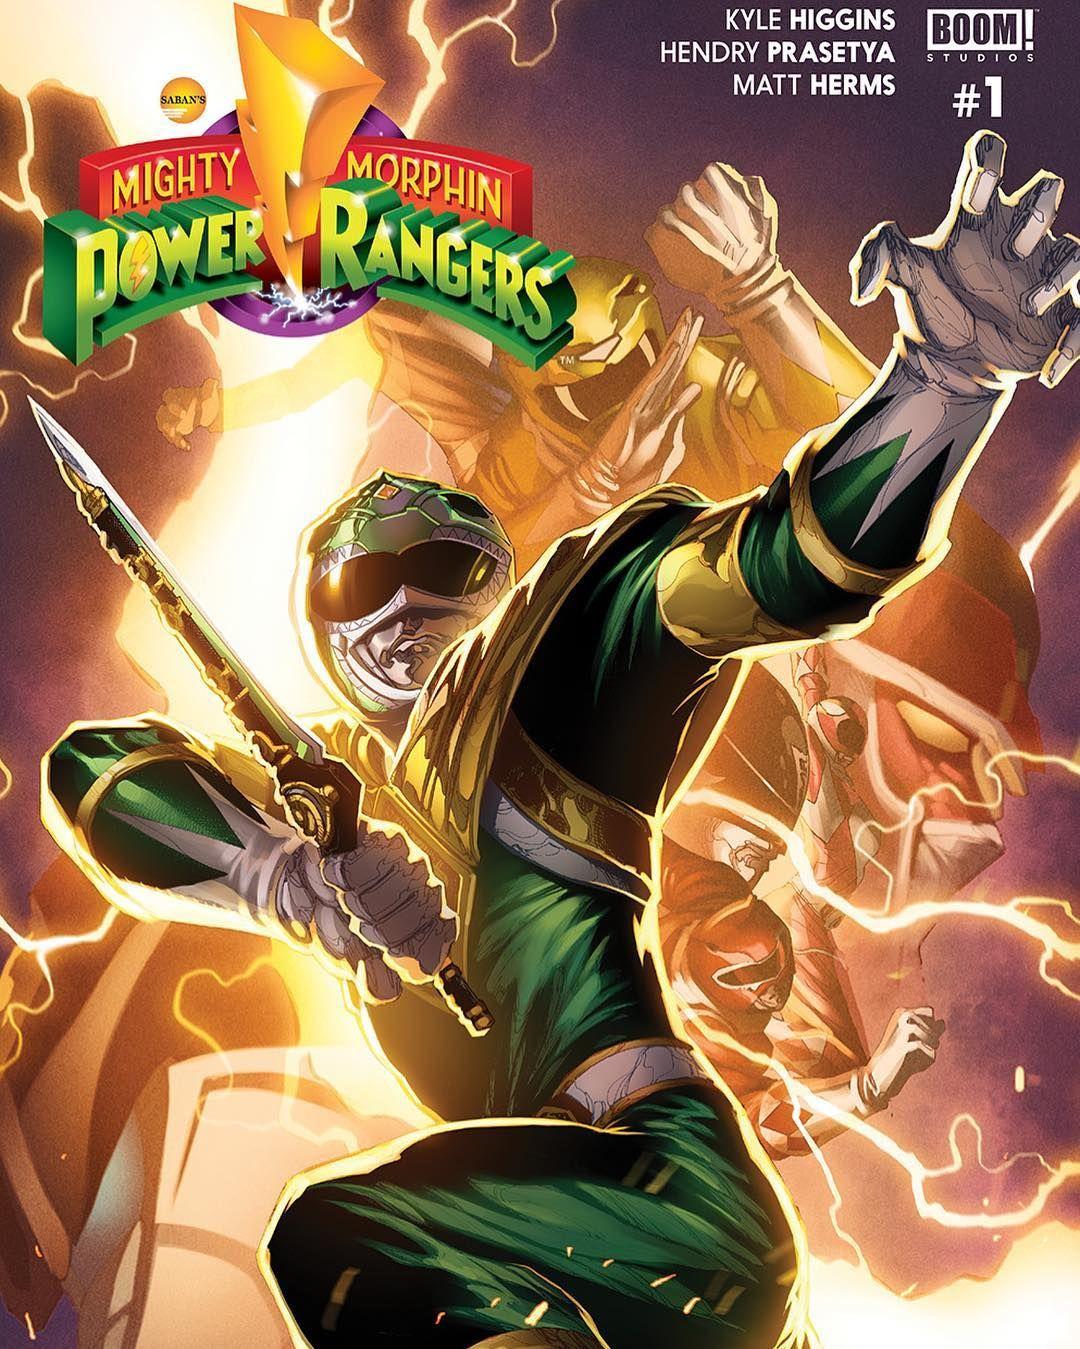 The Green Ranger  #powerrangers #redranger #whiteranger #yellowranger #blueranger #blackranger #pinkranger #greenranger #mmpr #mightymorphinpowerrangers #powerrangersmovie   #comicbooks #comics http://ift.tt/28YYpXr